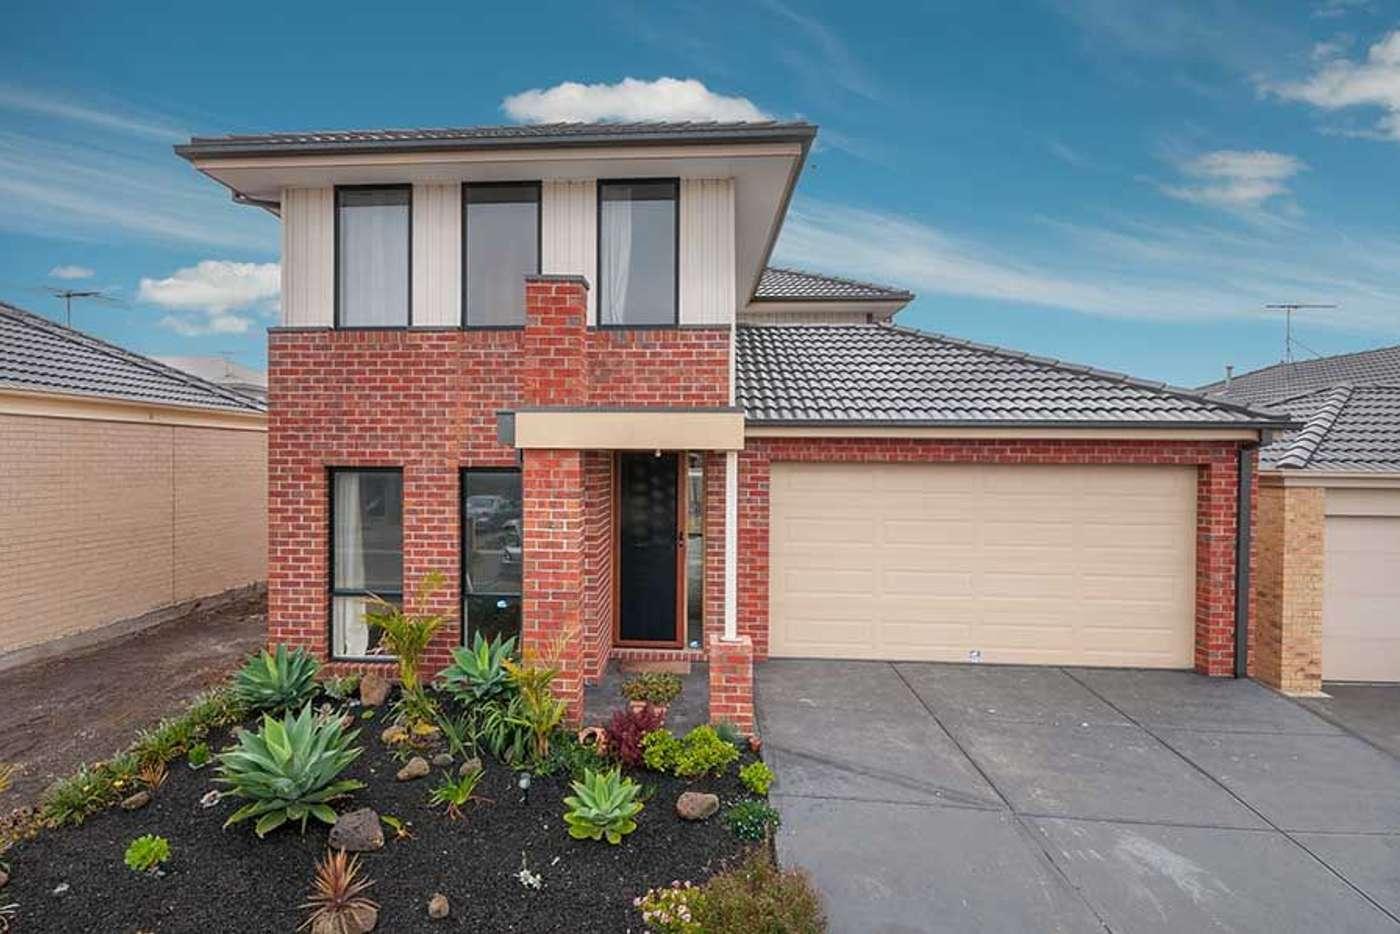 Main view of Homely house listing, 25 Gippsland Way, Craigieburn VIC 3064